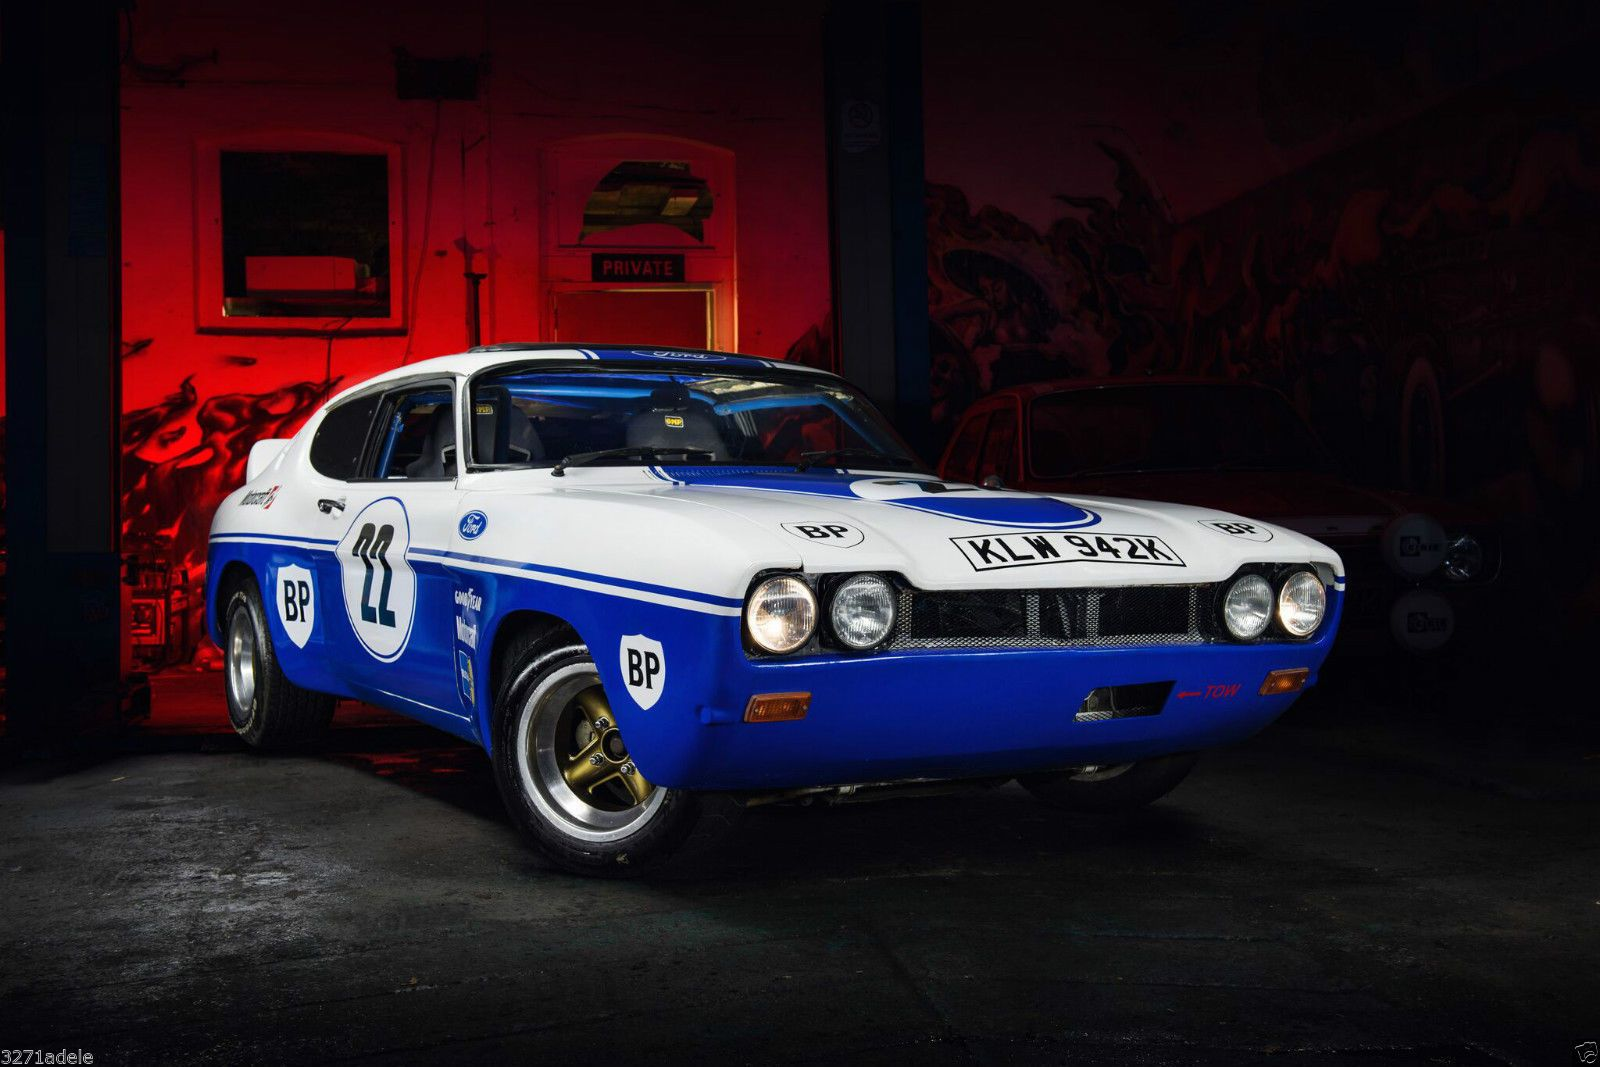 Ford Capri 2.8 i road race rally track day car | Ford capri, Rally ...